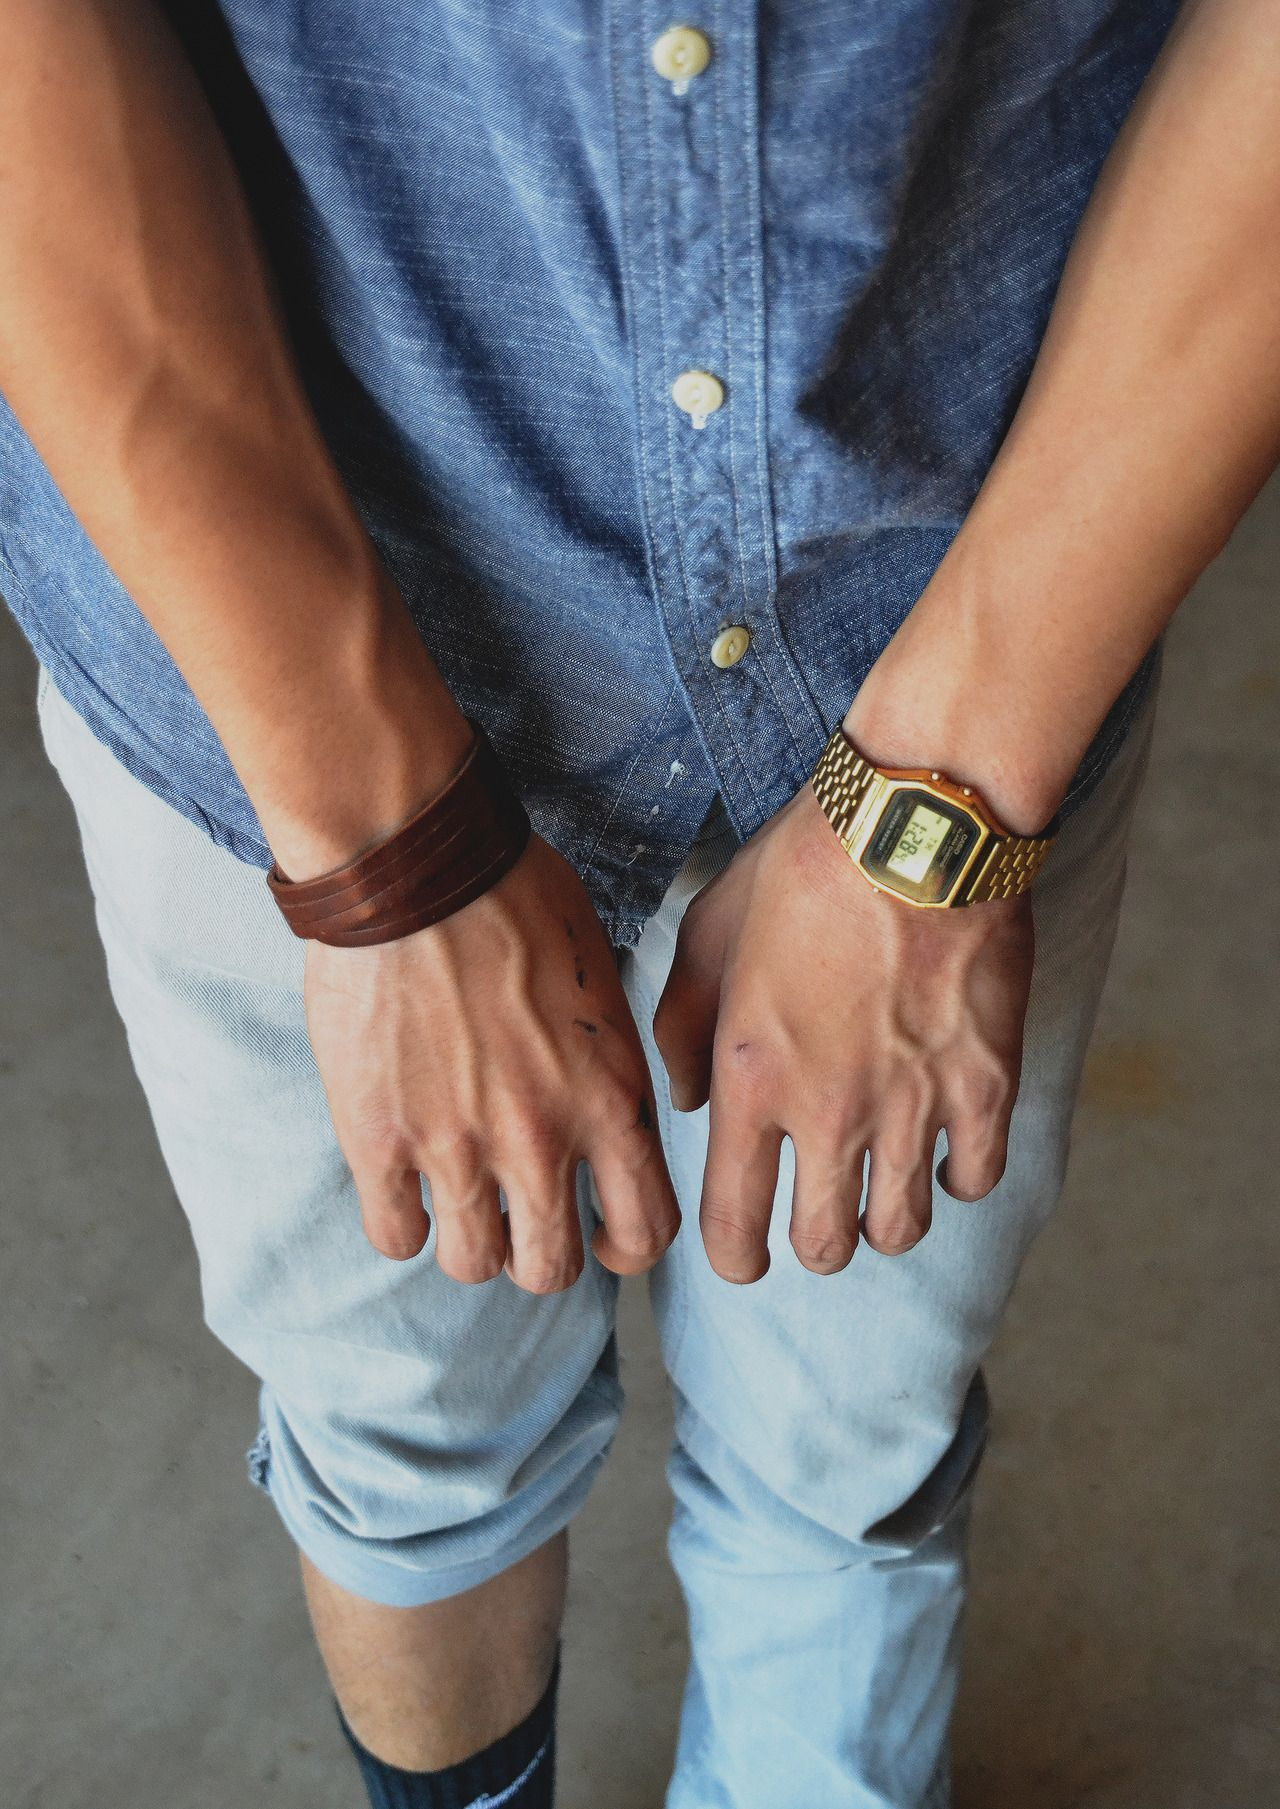 men s fashion style sence clothing men s ootd denim shirt gold men s fashion style sence clothing men s ootd denim shirt gold whatch bracelet bluish pants